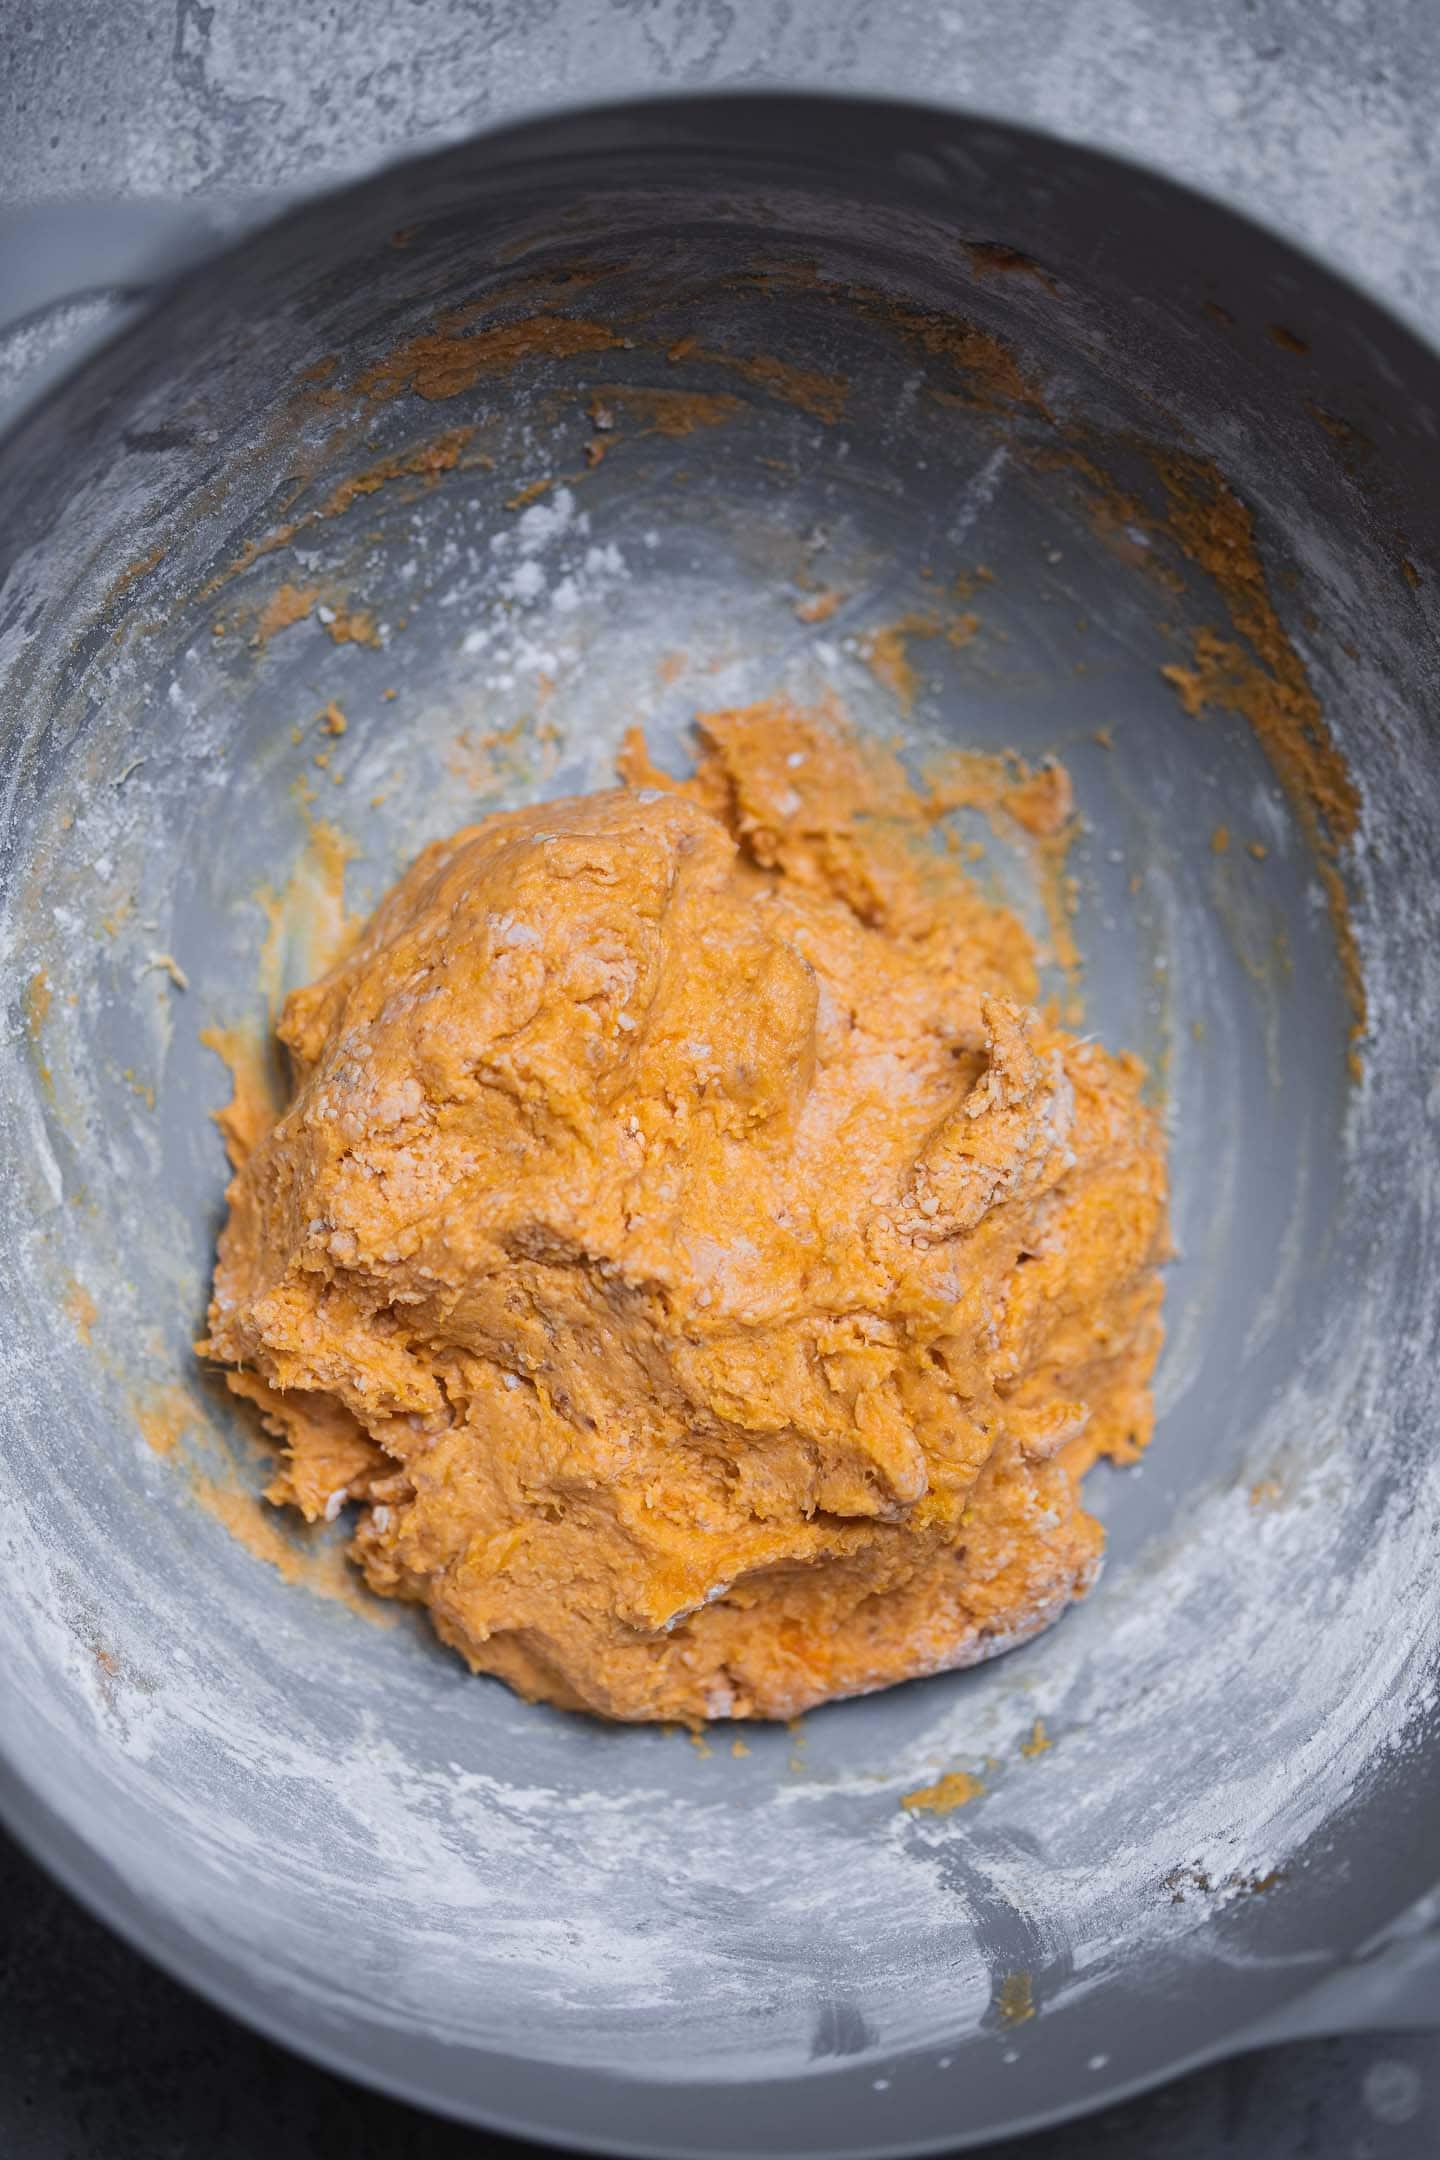 Dough for sweet potato gnocchi